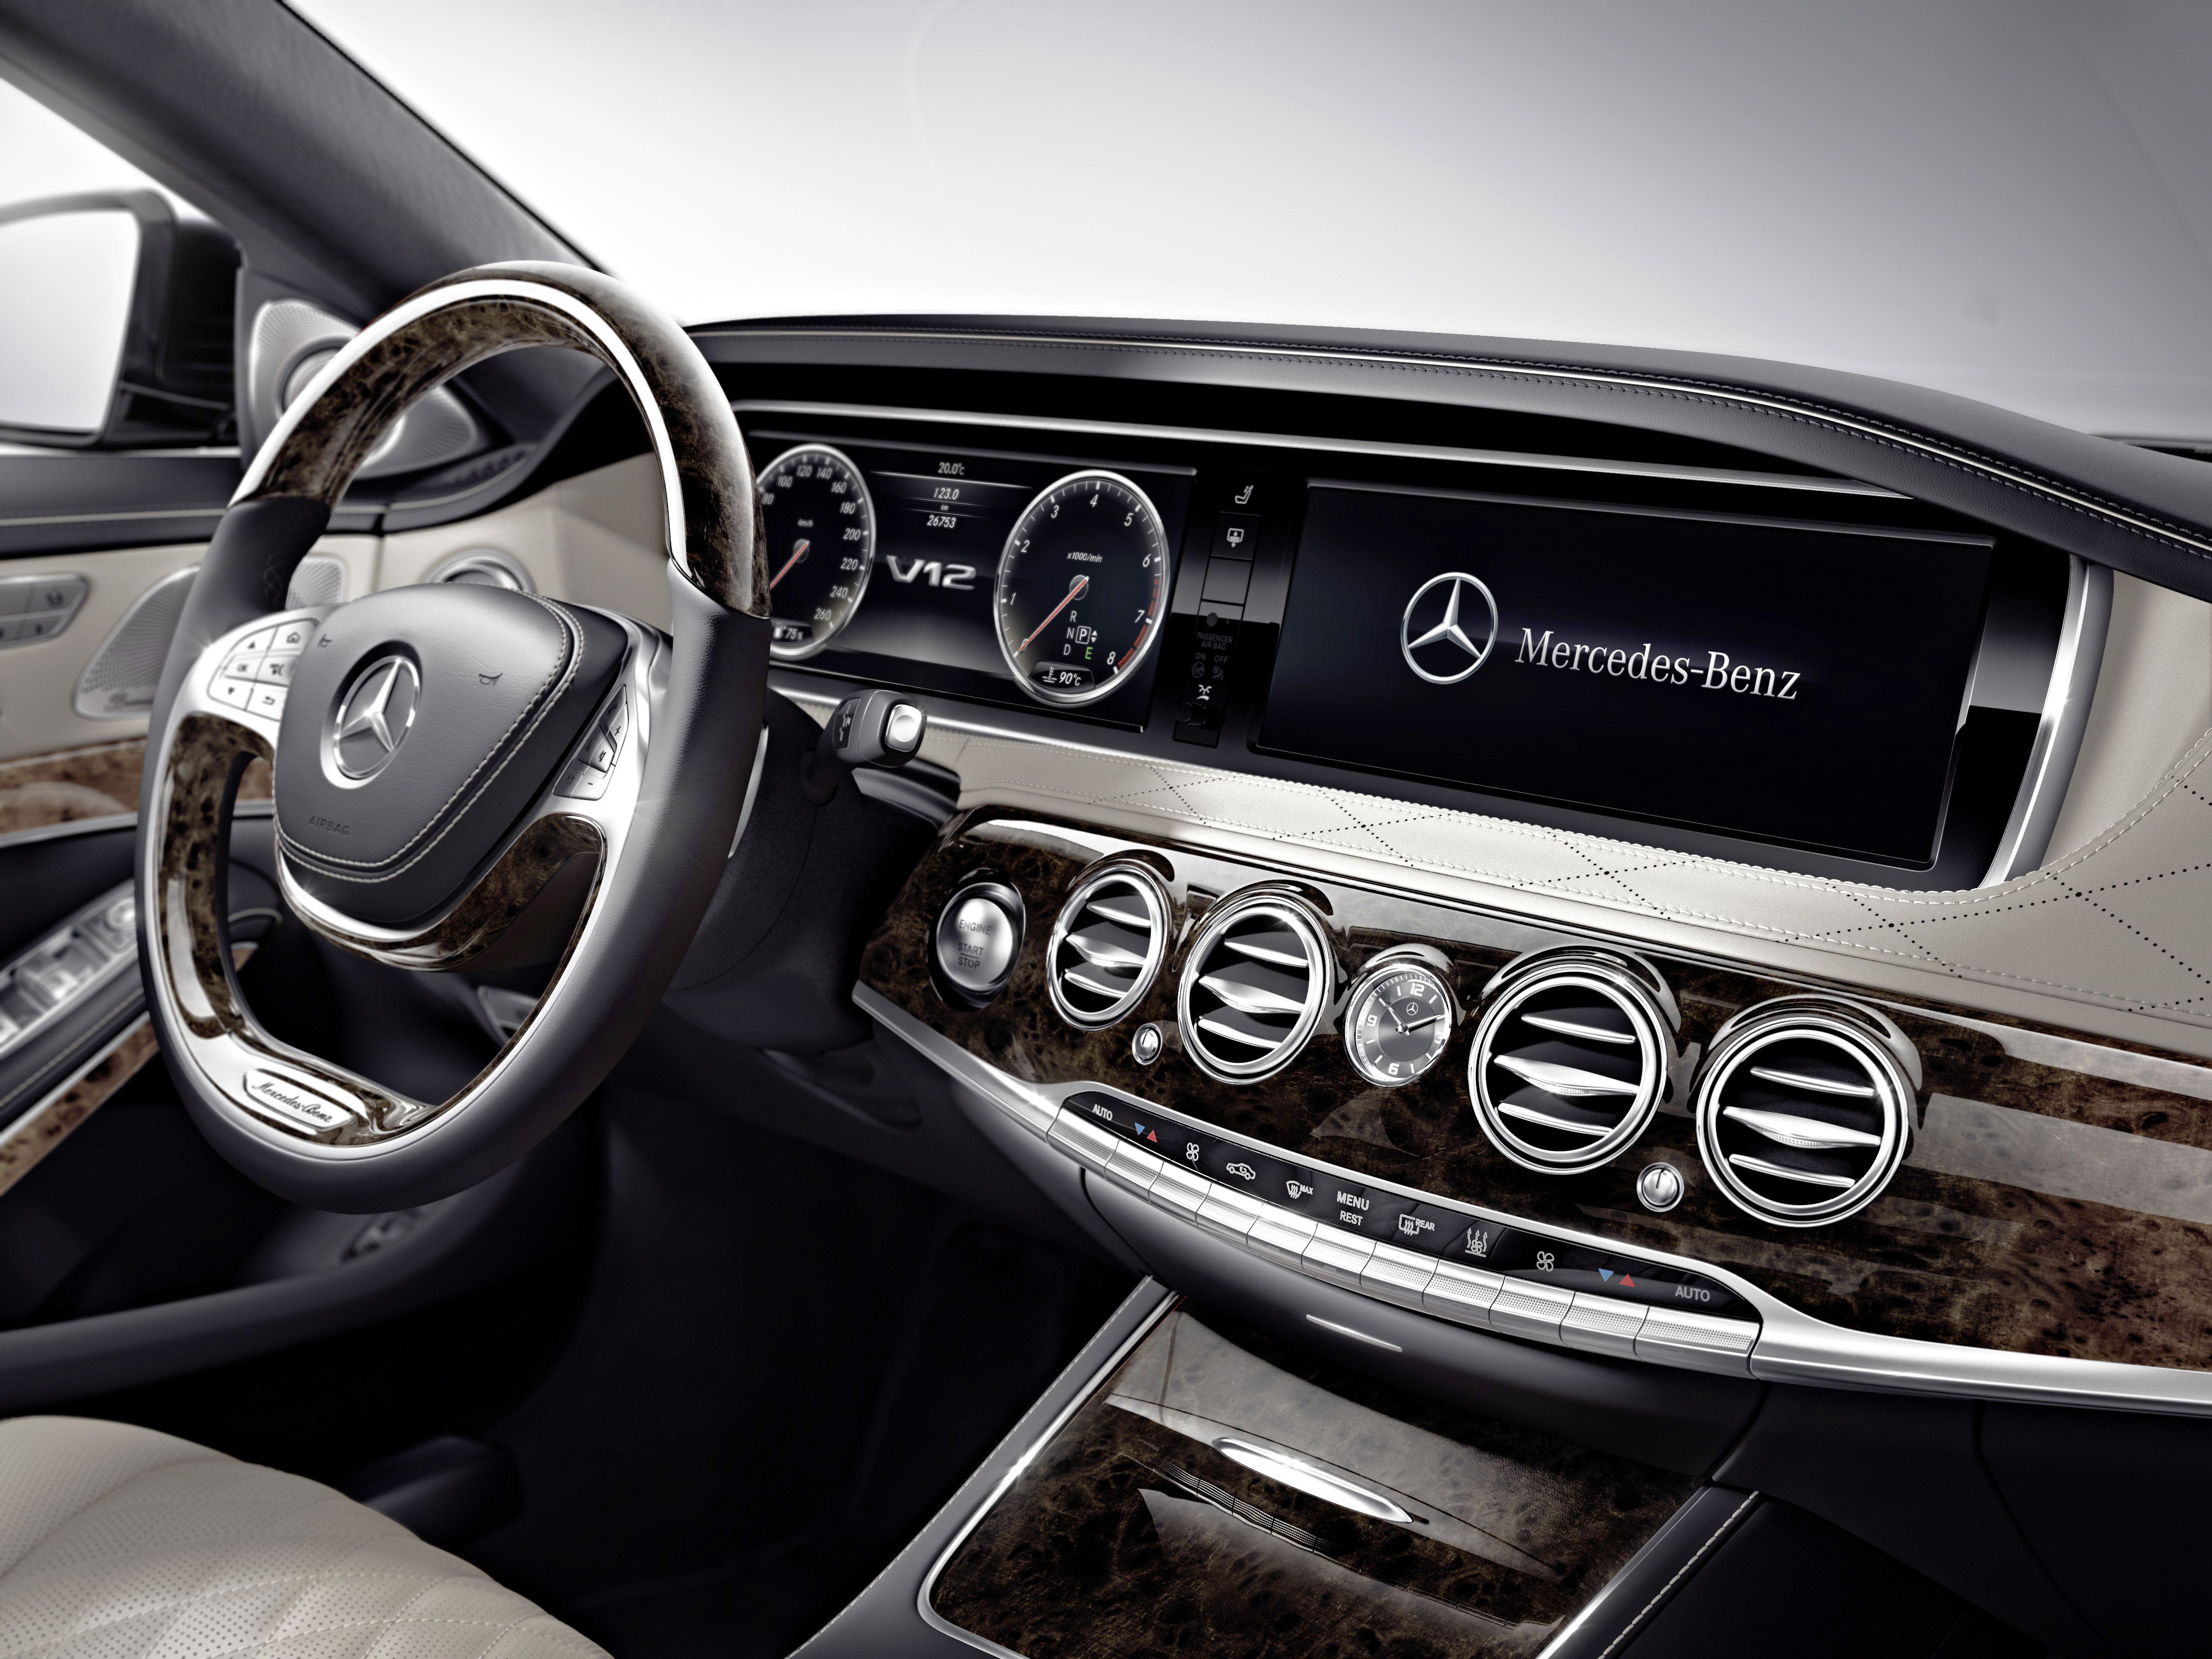 2015 Mercedes Benz S 600 Mercedes Maybach Mercedes Maybach S600 Mercedes Benz